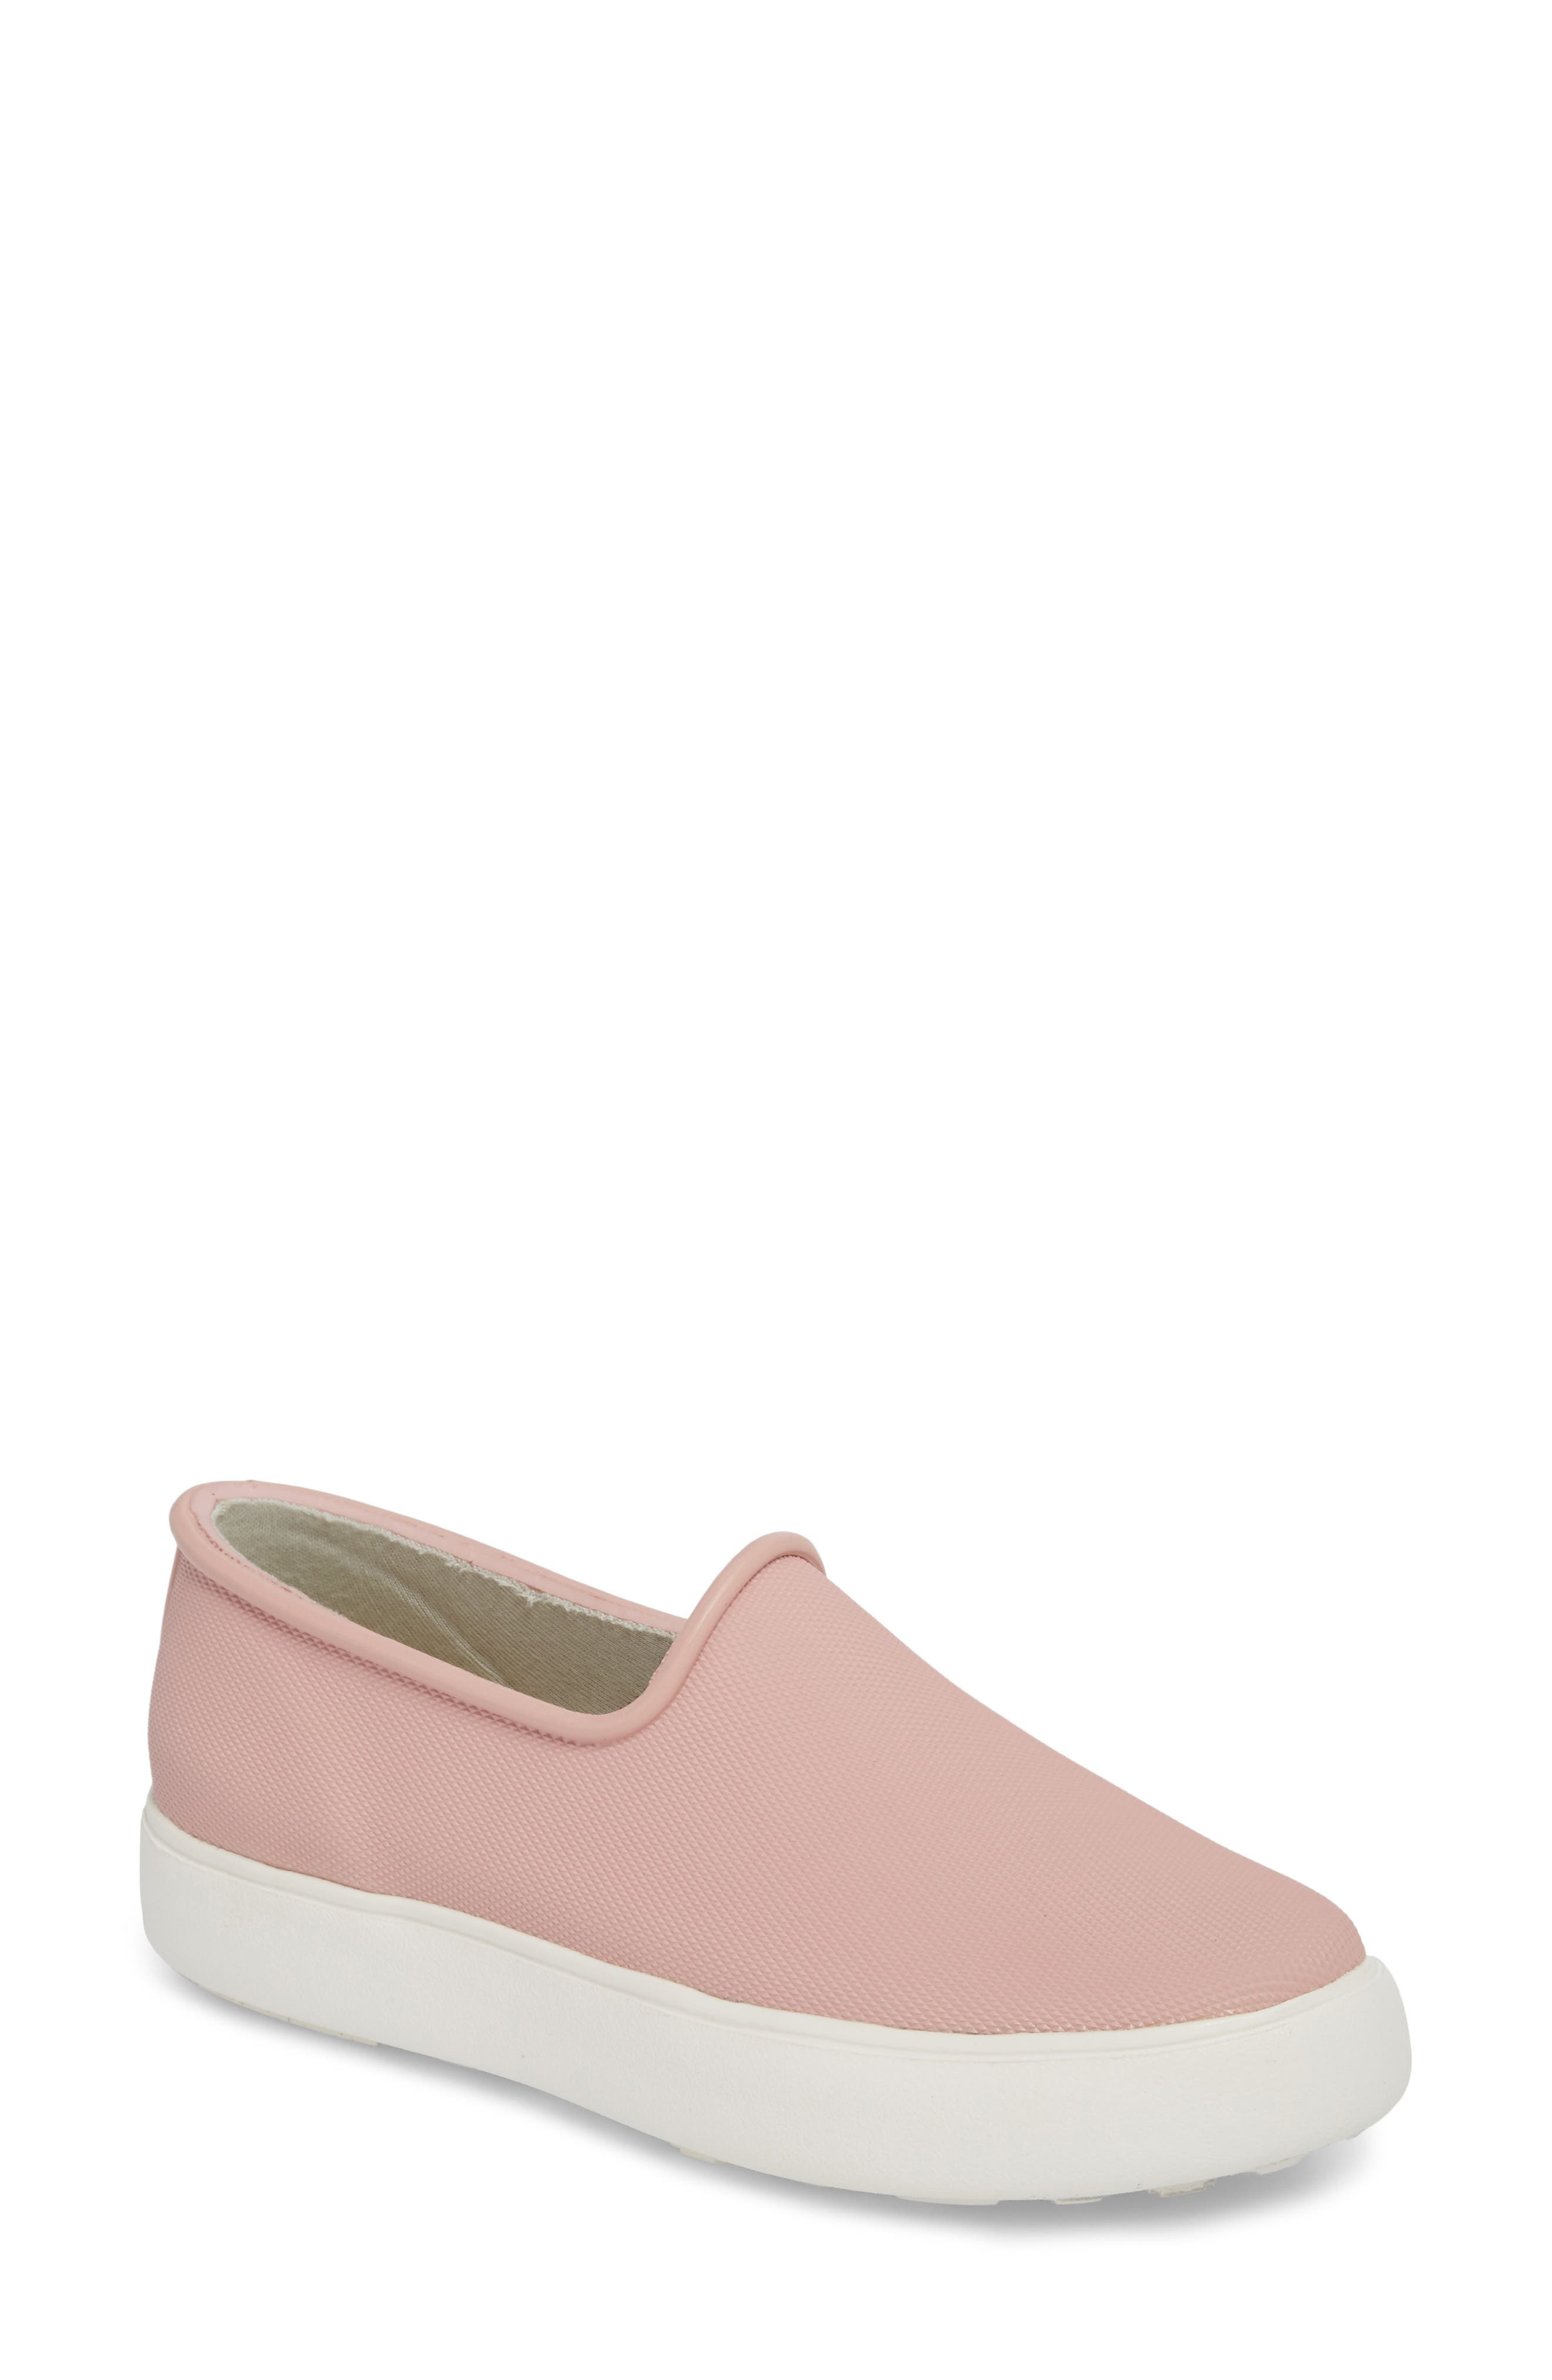 Rainy Day Waterproof Slip-On Sneaker,                         Main,                         color, Dusty Pink